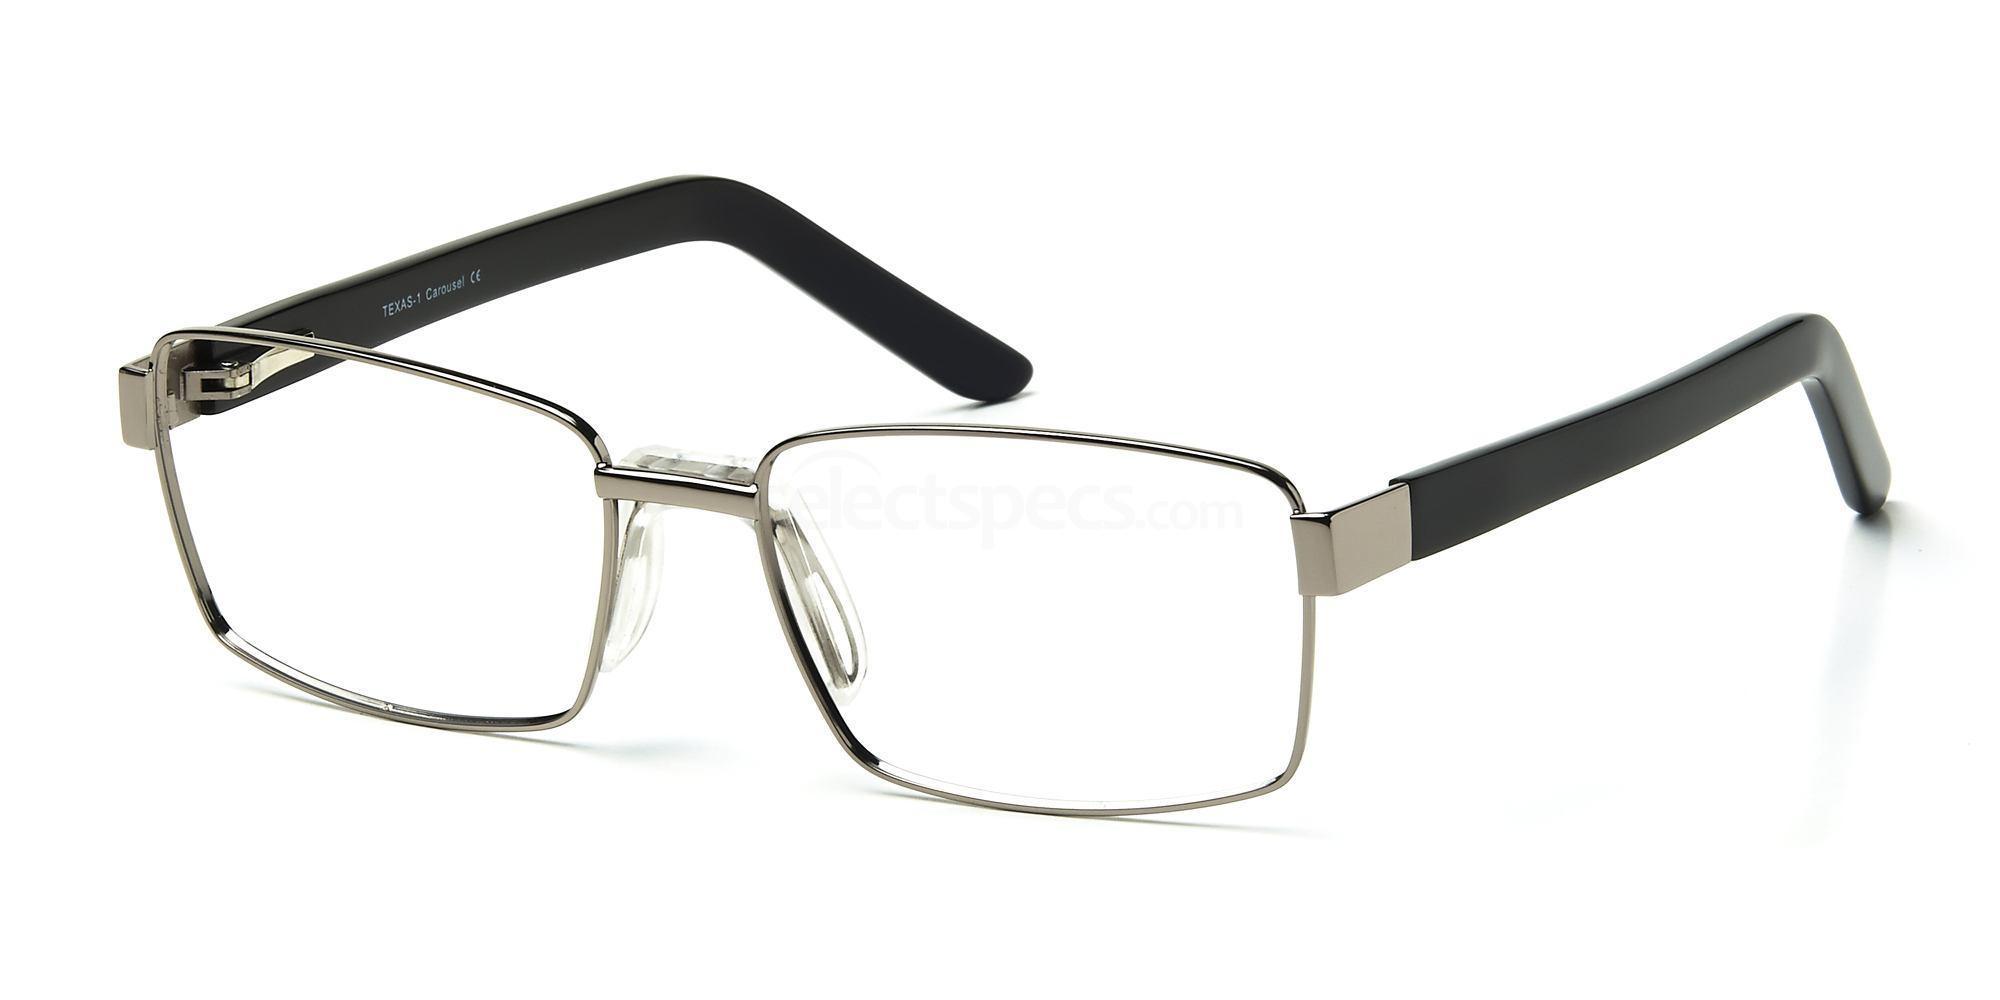 C1 TEXAS1 Glasses, Carousel +